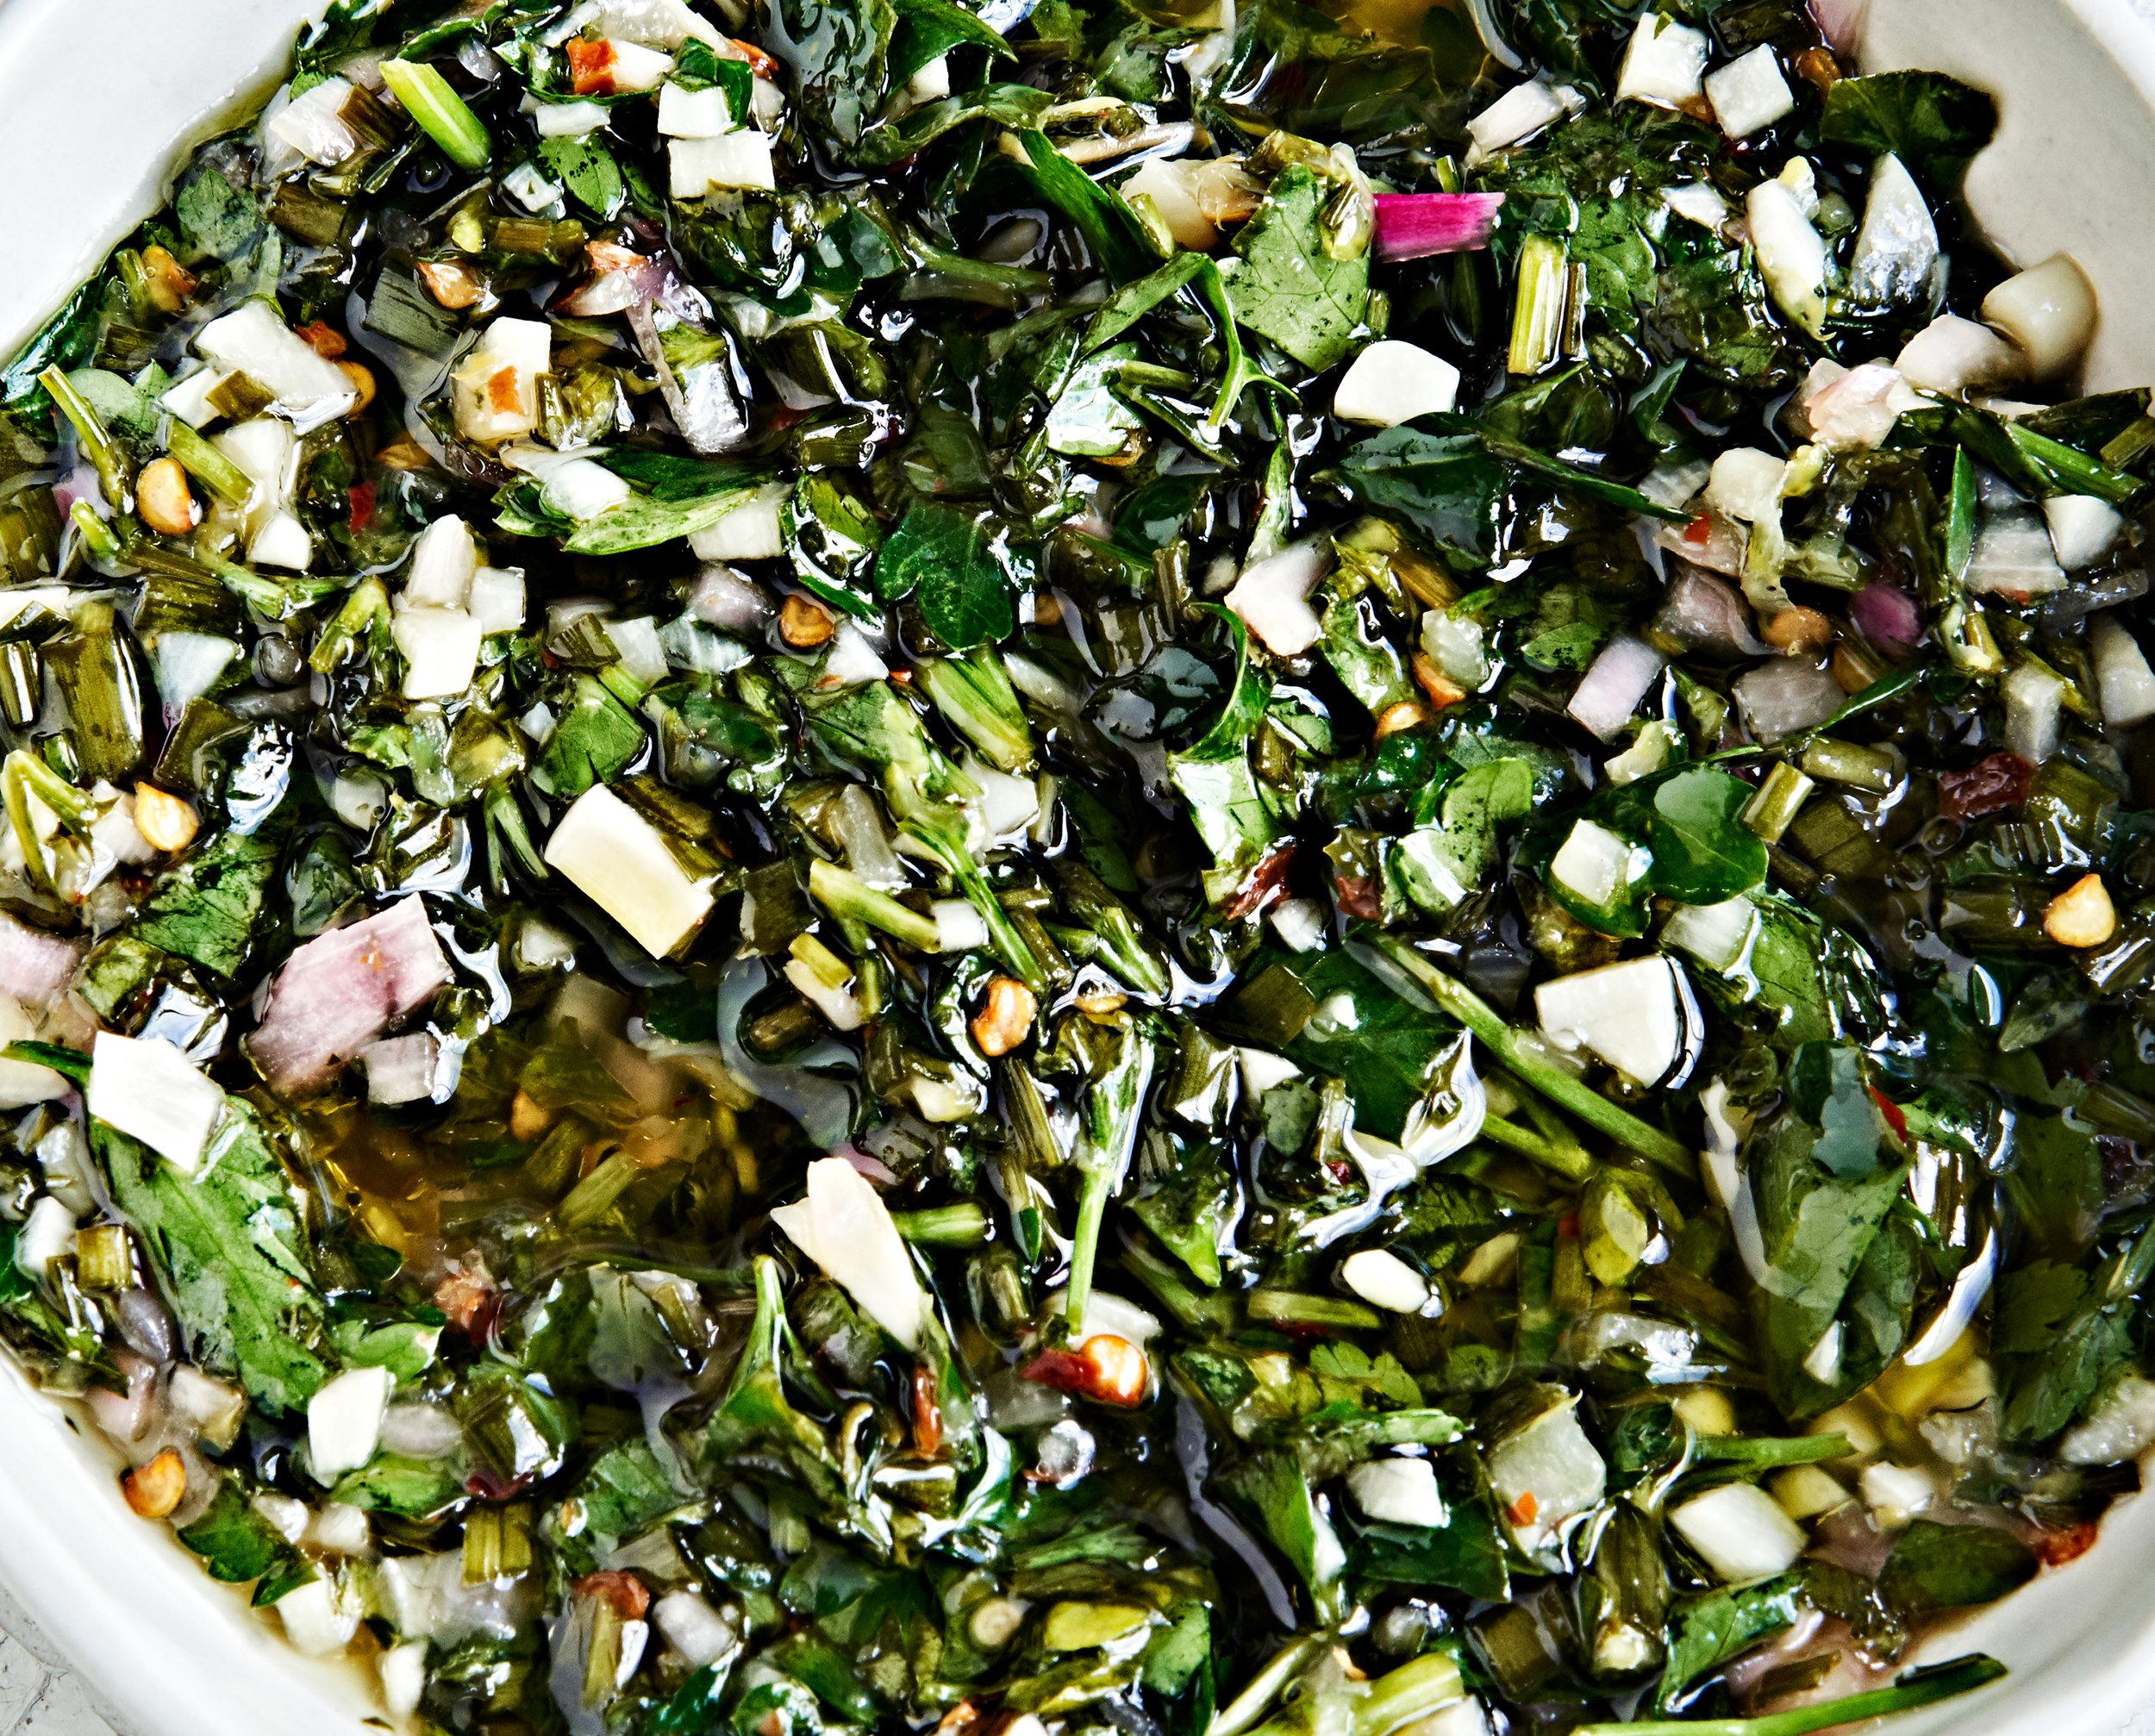 Close-up authentic chimichurri sauce